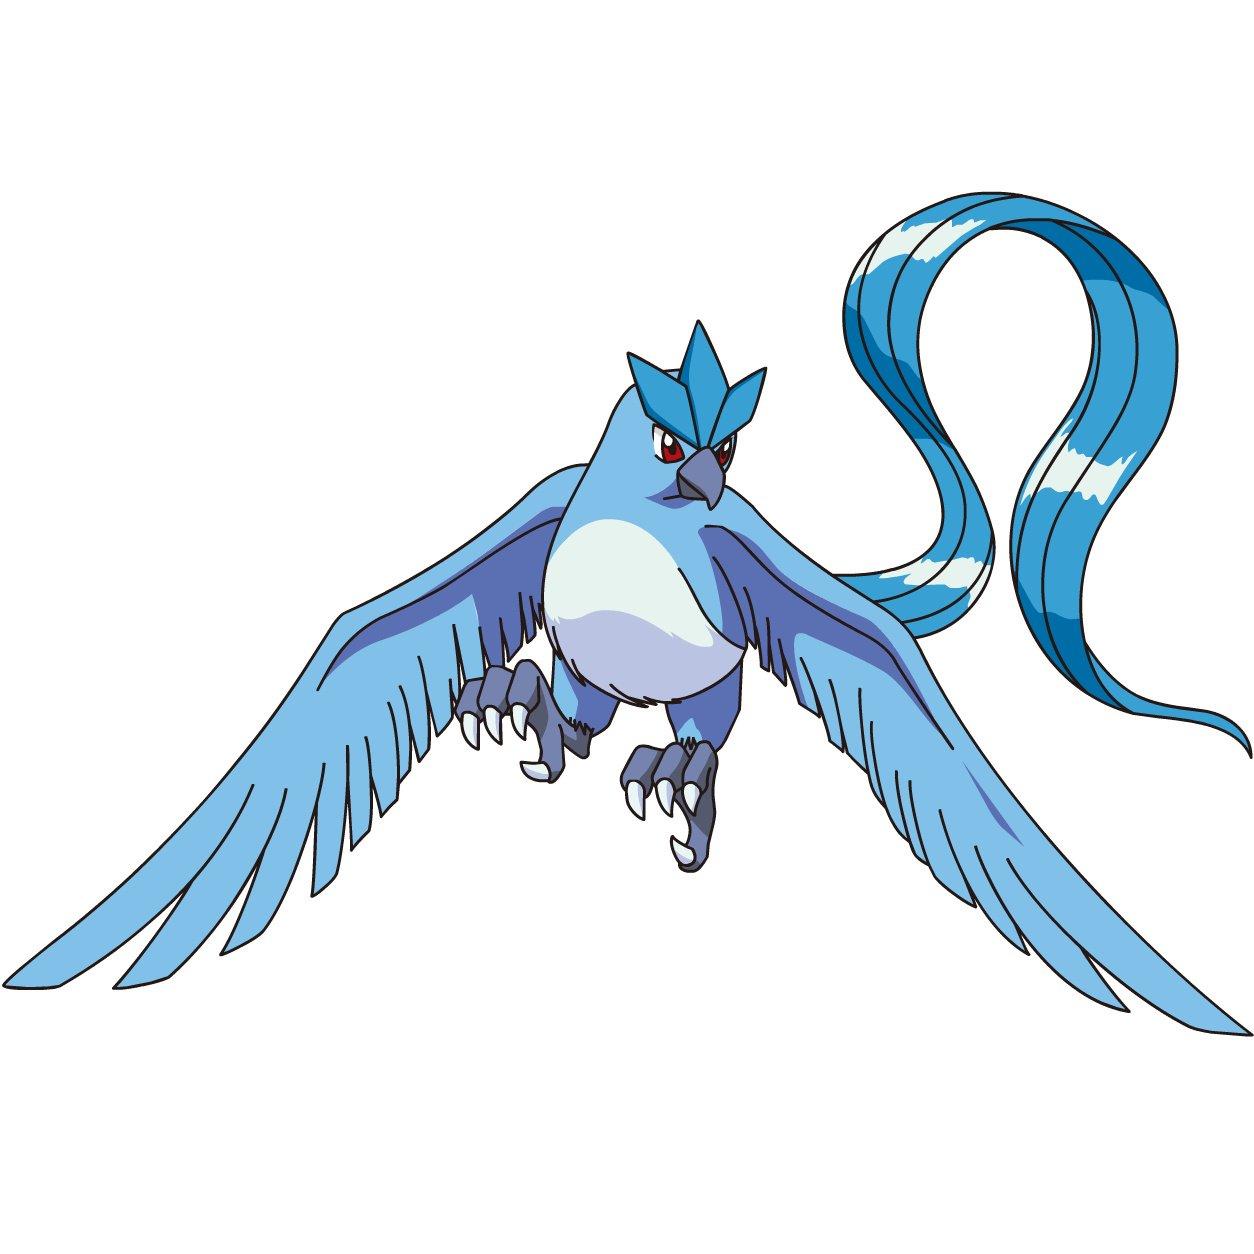 Rumour Articuno Has Been Caught In Pokemon Go